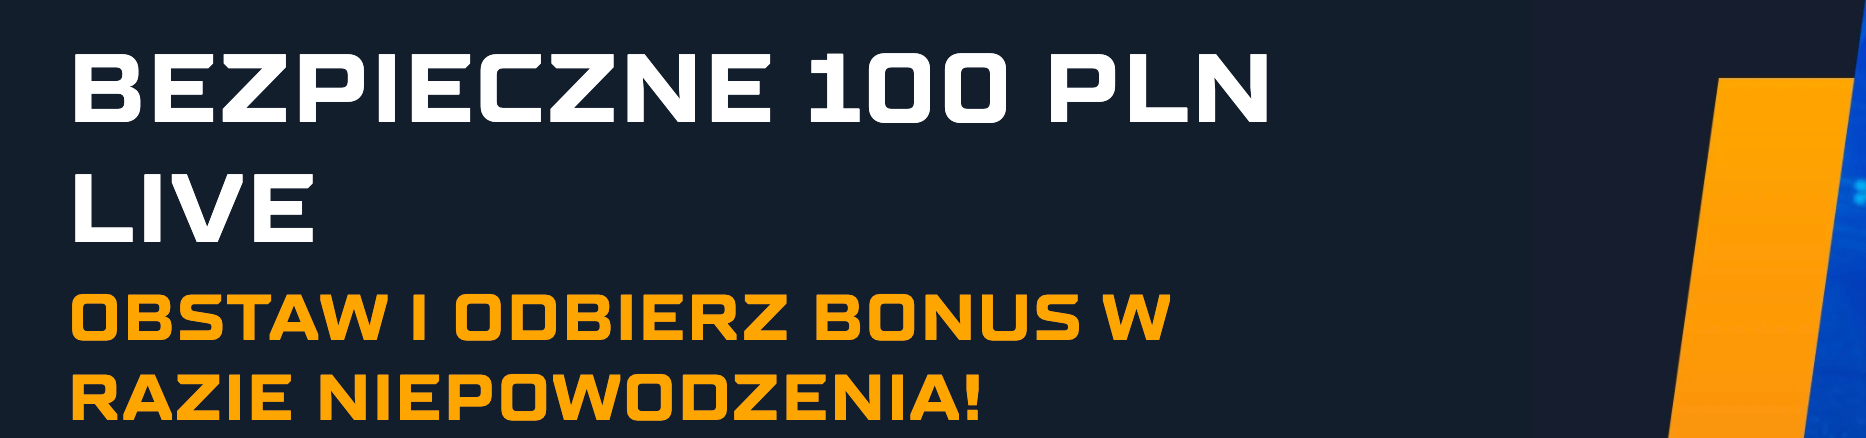 Bonus na polska słowacja sts